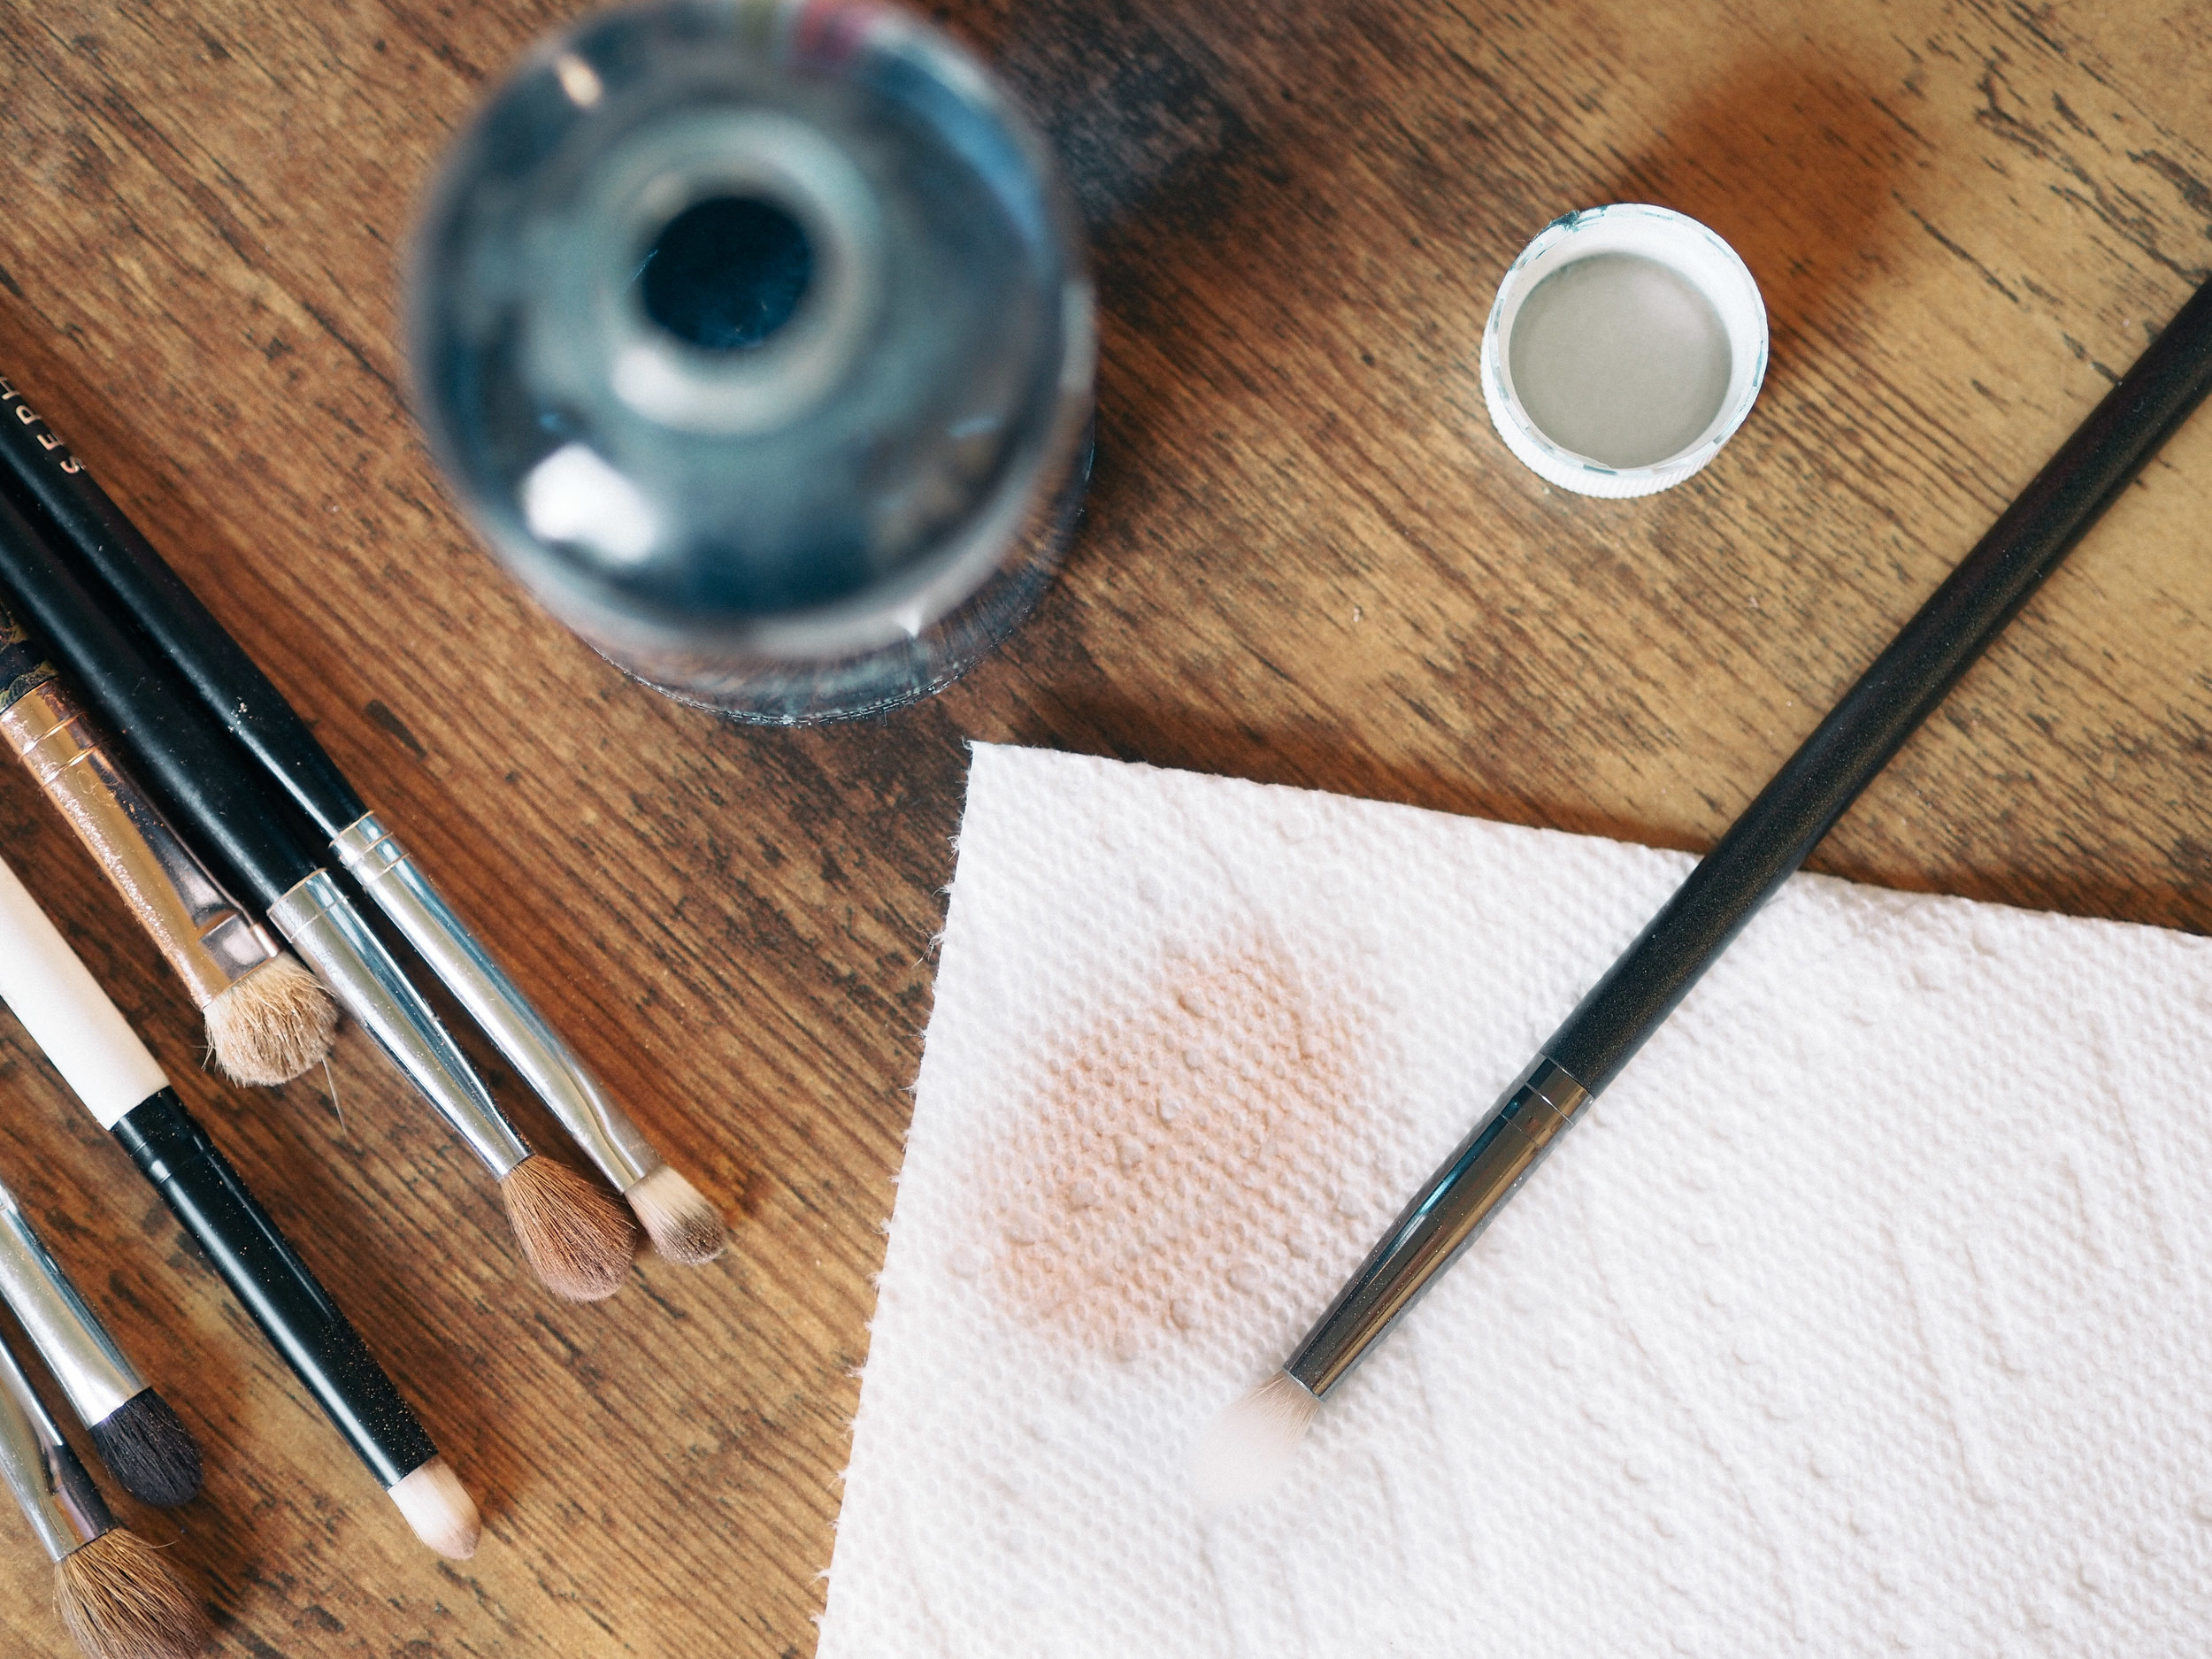 cinema-secrets-makeup-brush-cleaner-review-3.jpg